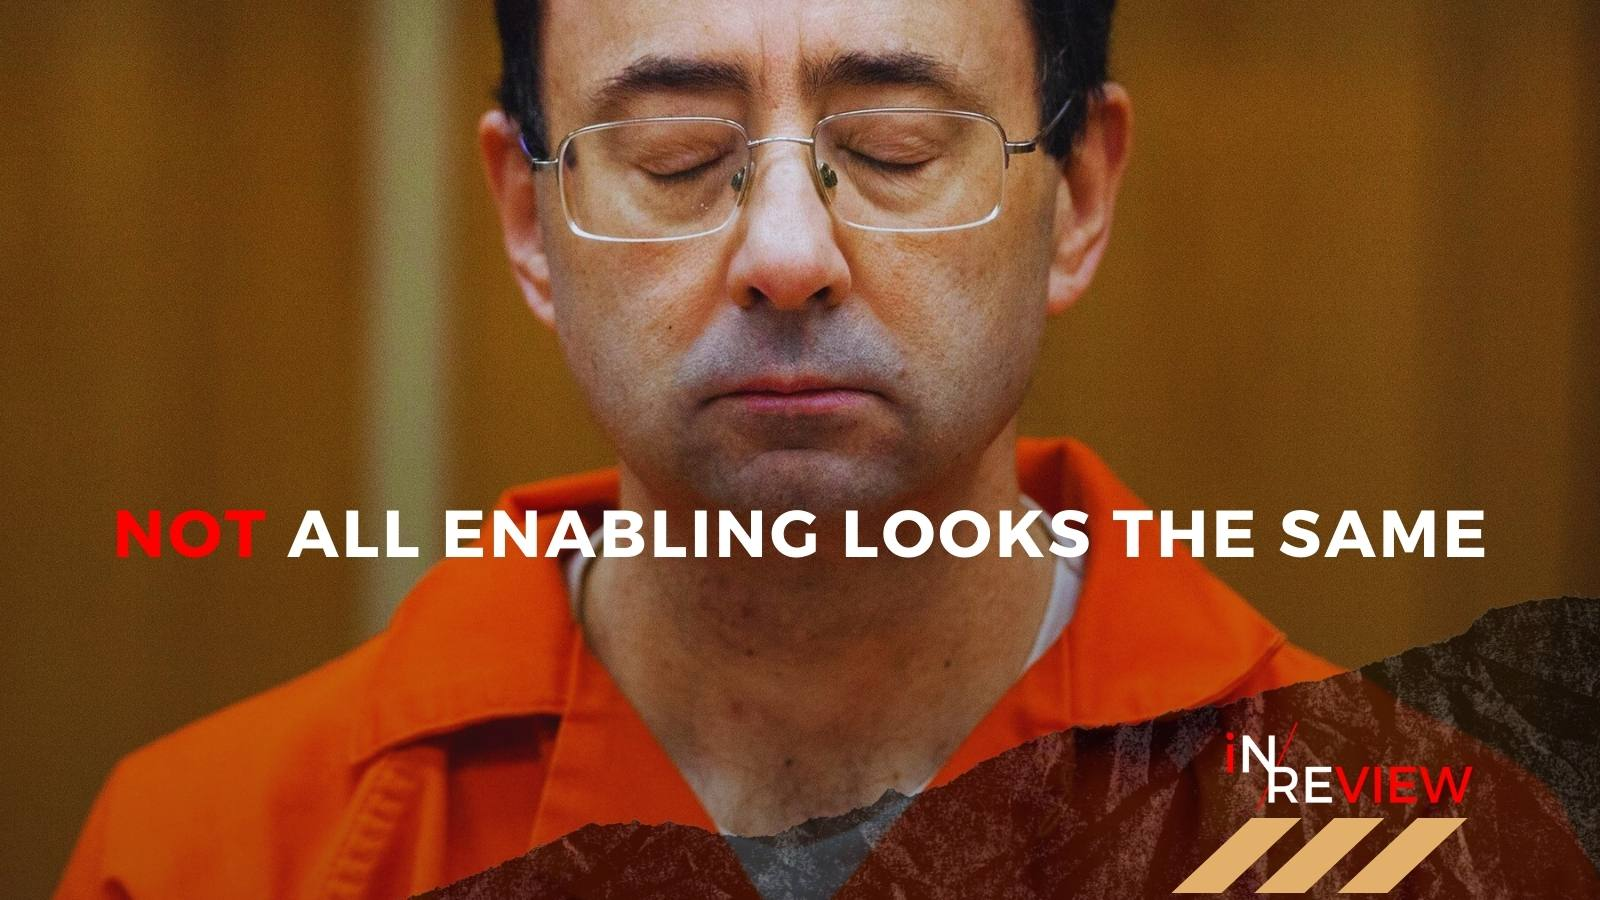 Larry nassar USA gymnastics simone biles Olympic Committee sexual abuse